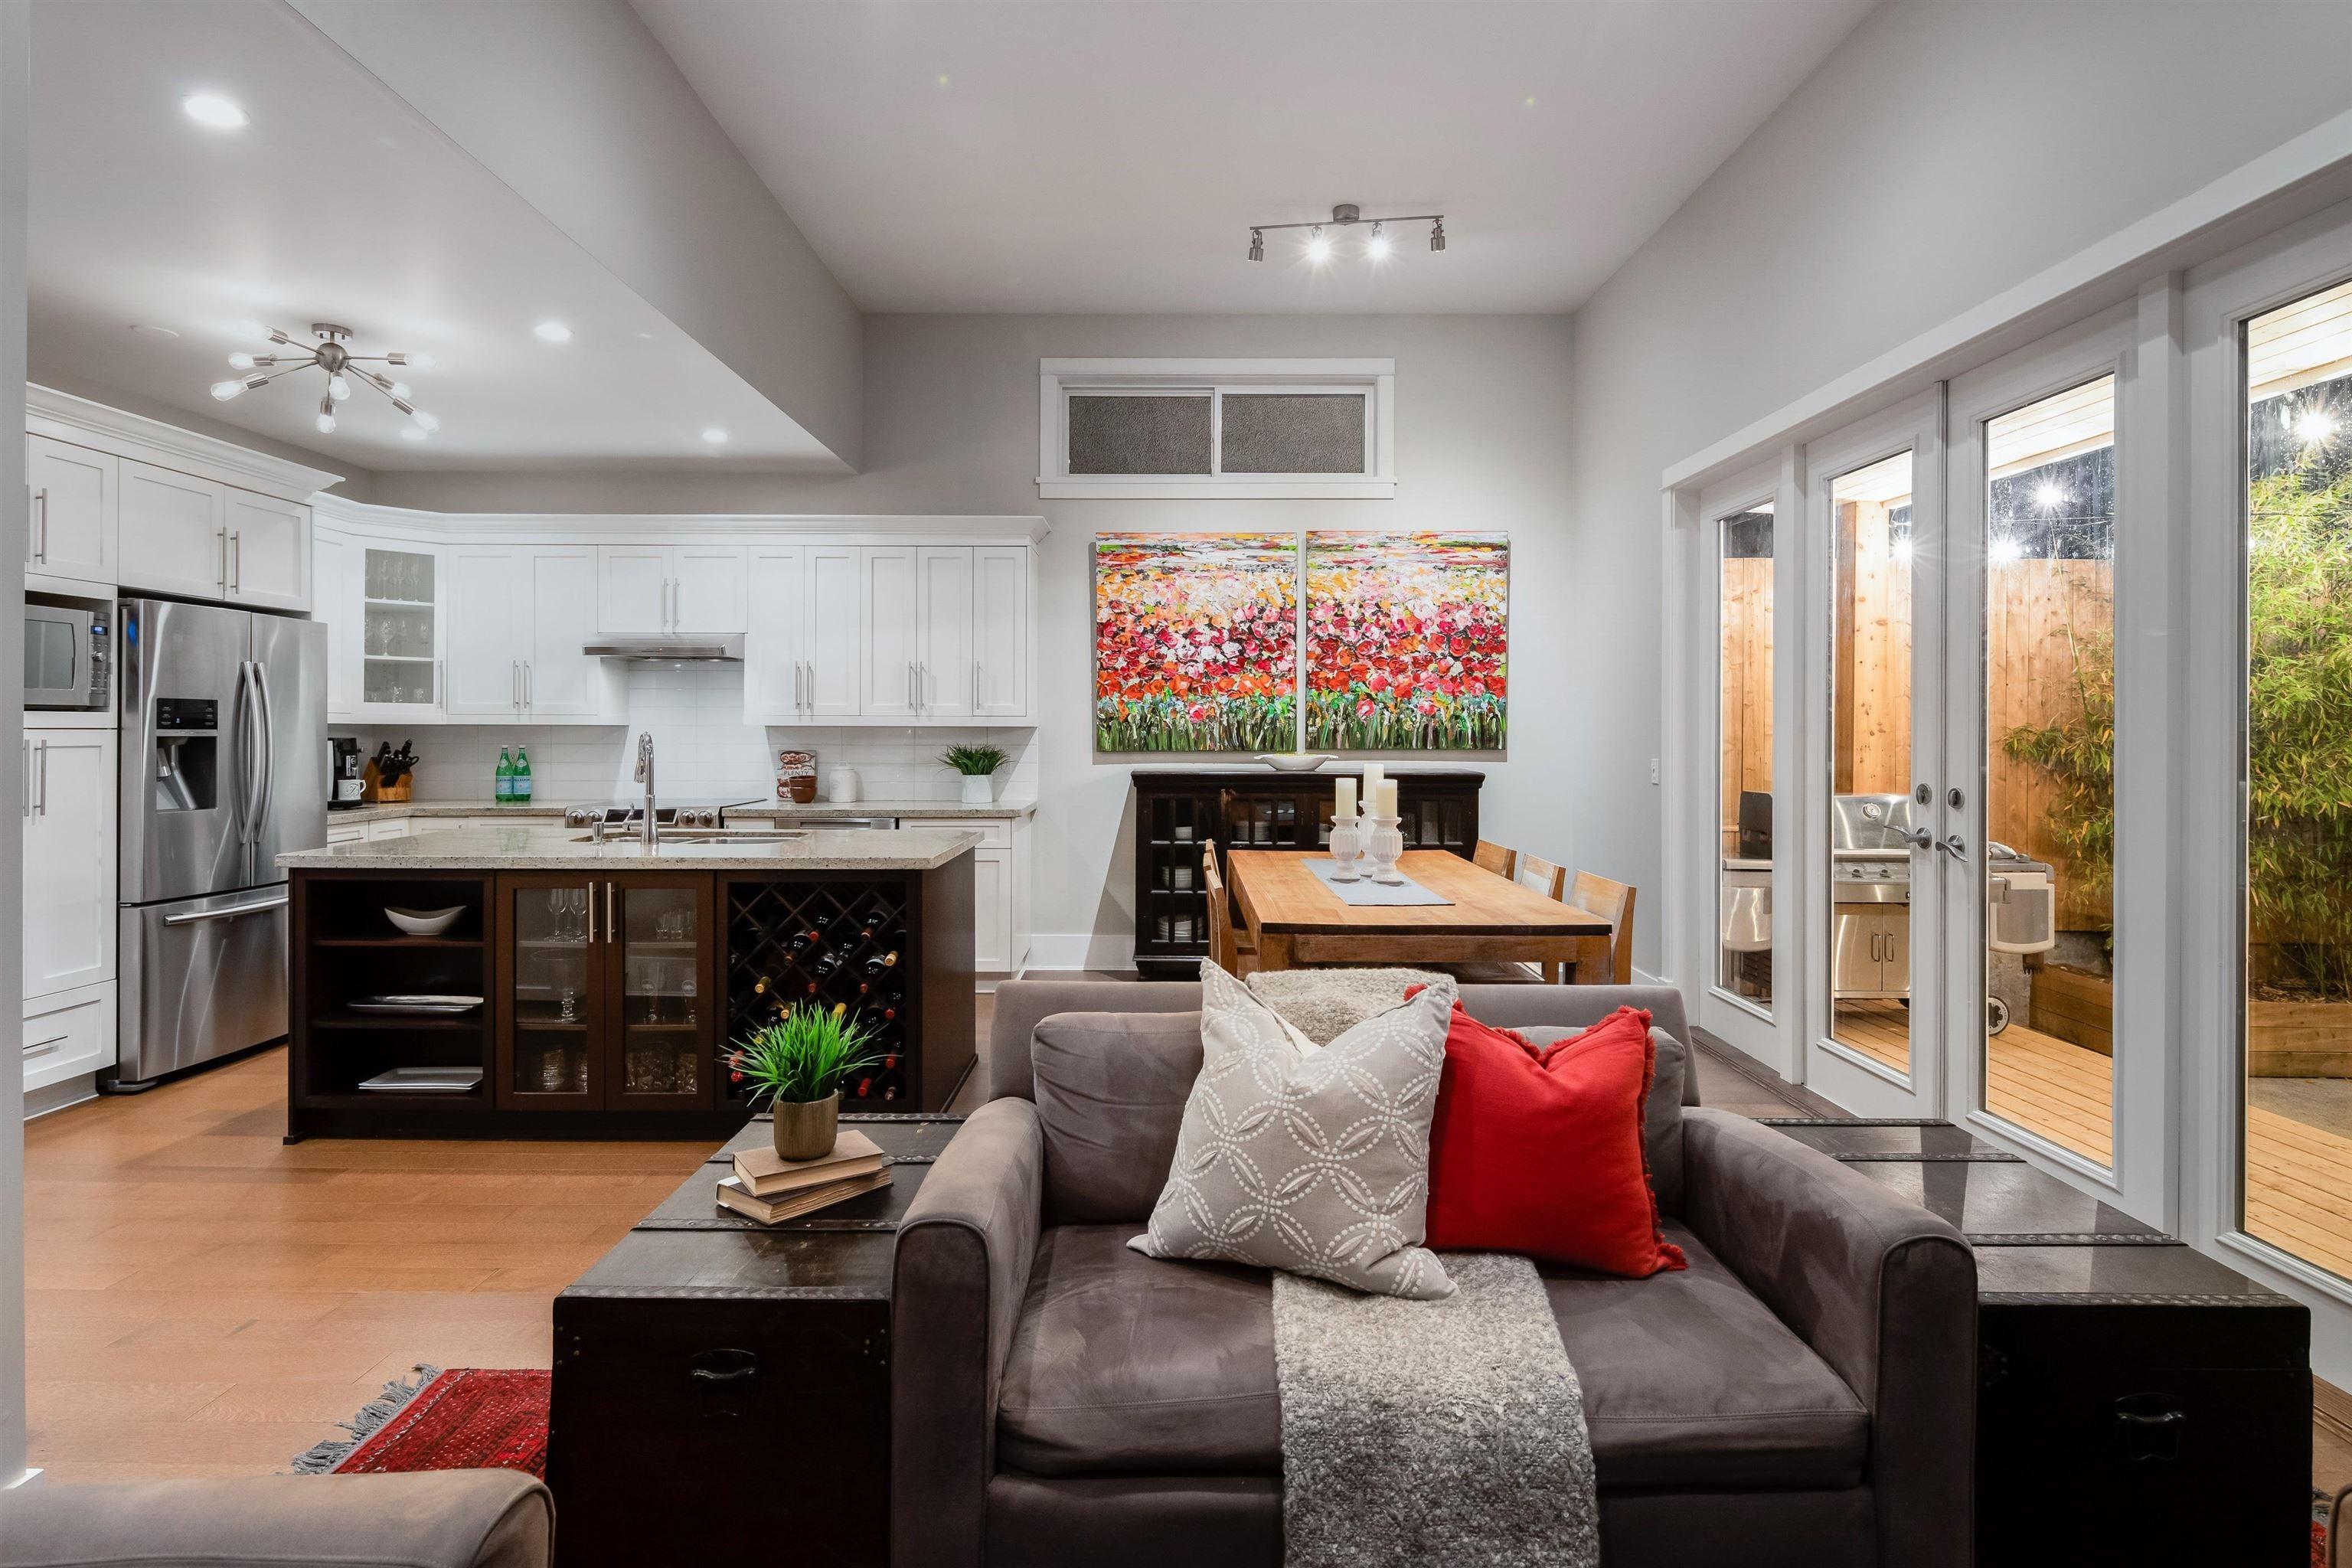 2258 WINDRIDGE DRIVE - Seymour NV House/Single Family for sale, 5 Bedrooms (R2617156) - #9